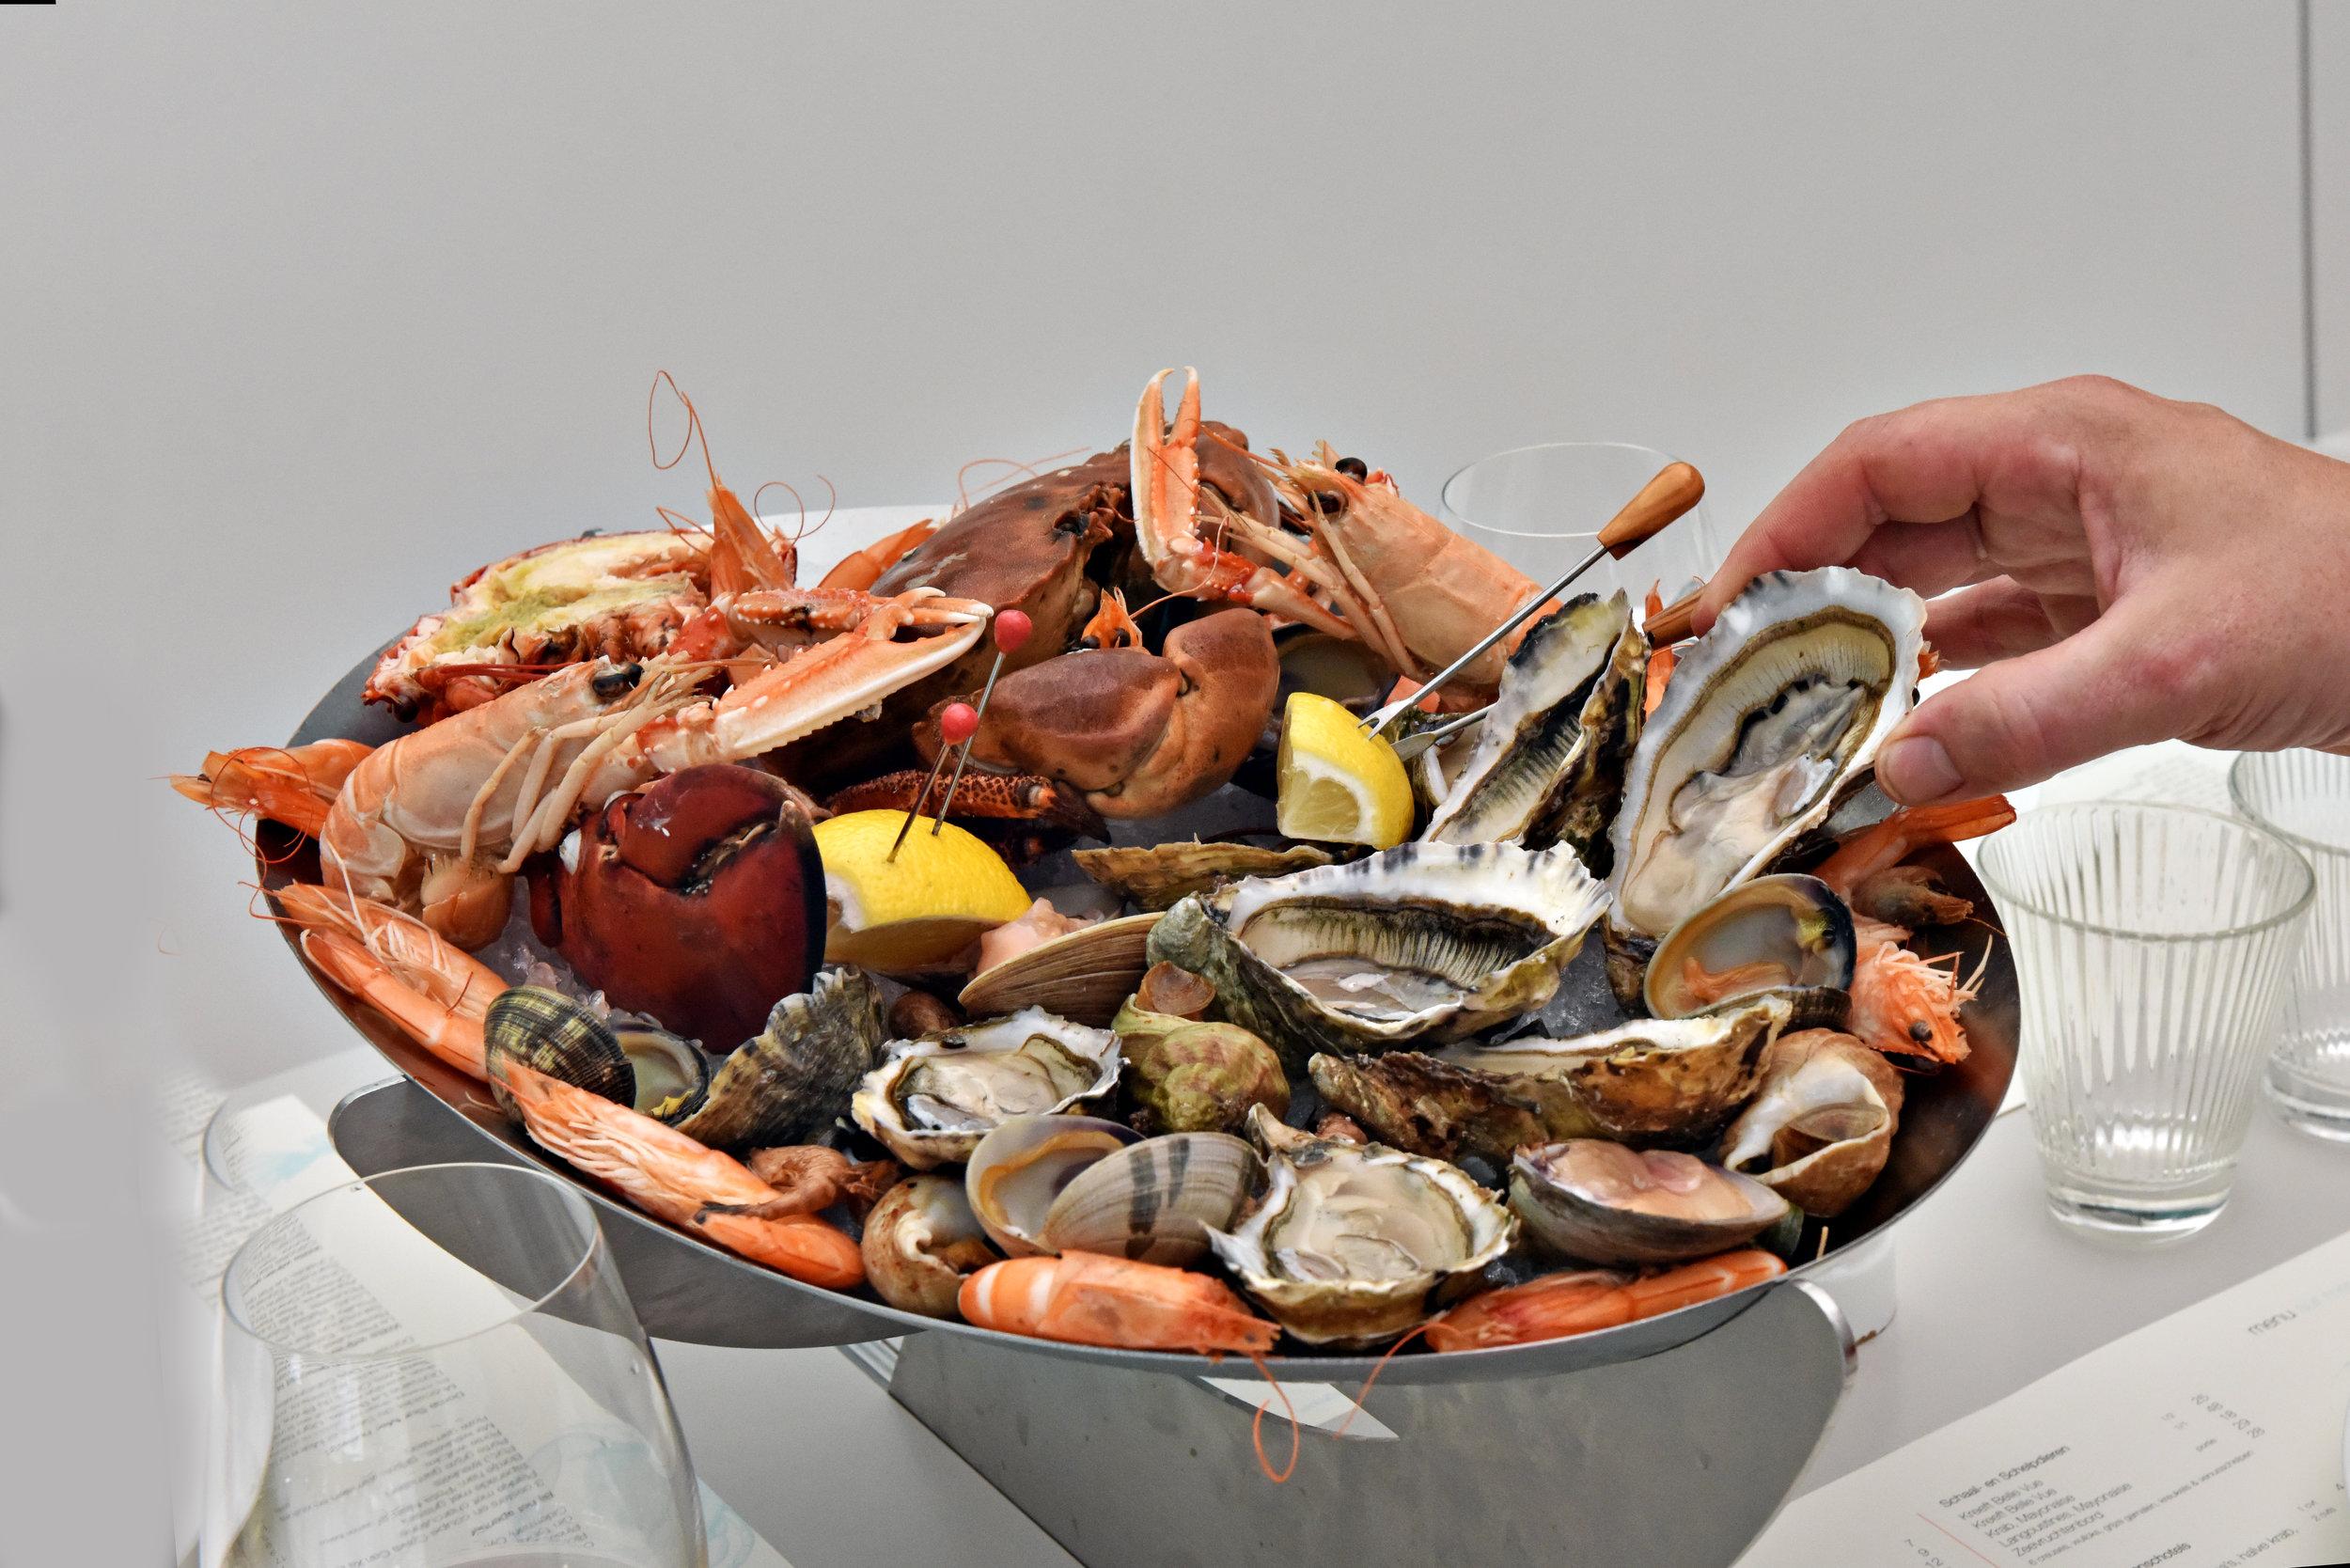 9 dome sur mer seafood schaal schelp kreeft restaurant bistro antwerpen frederic chabbert michelinstar bart albrecht tablefever.jpg